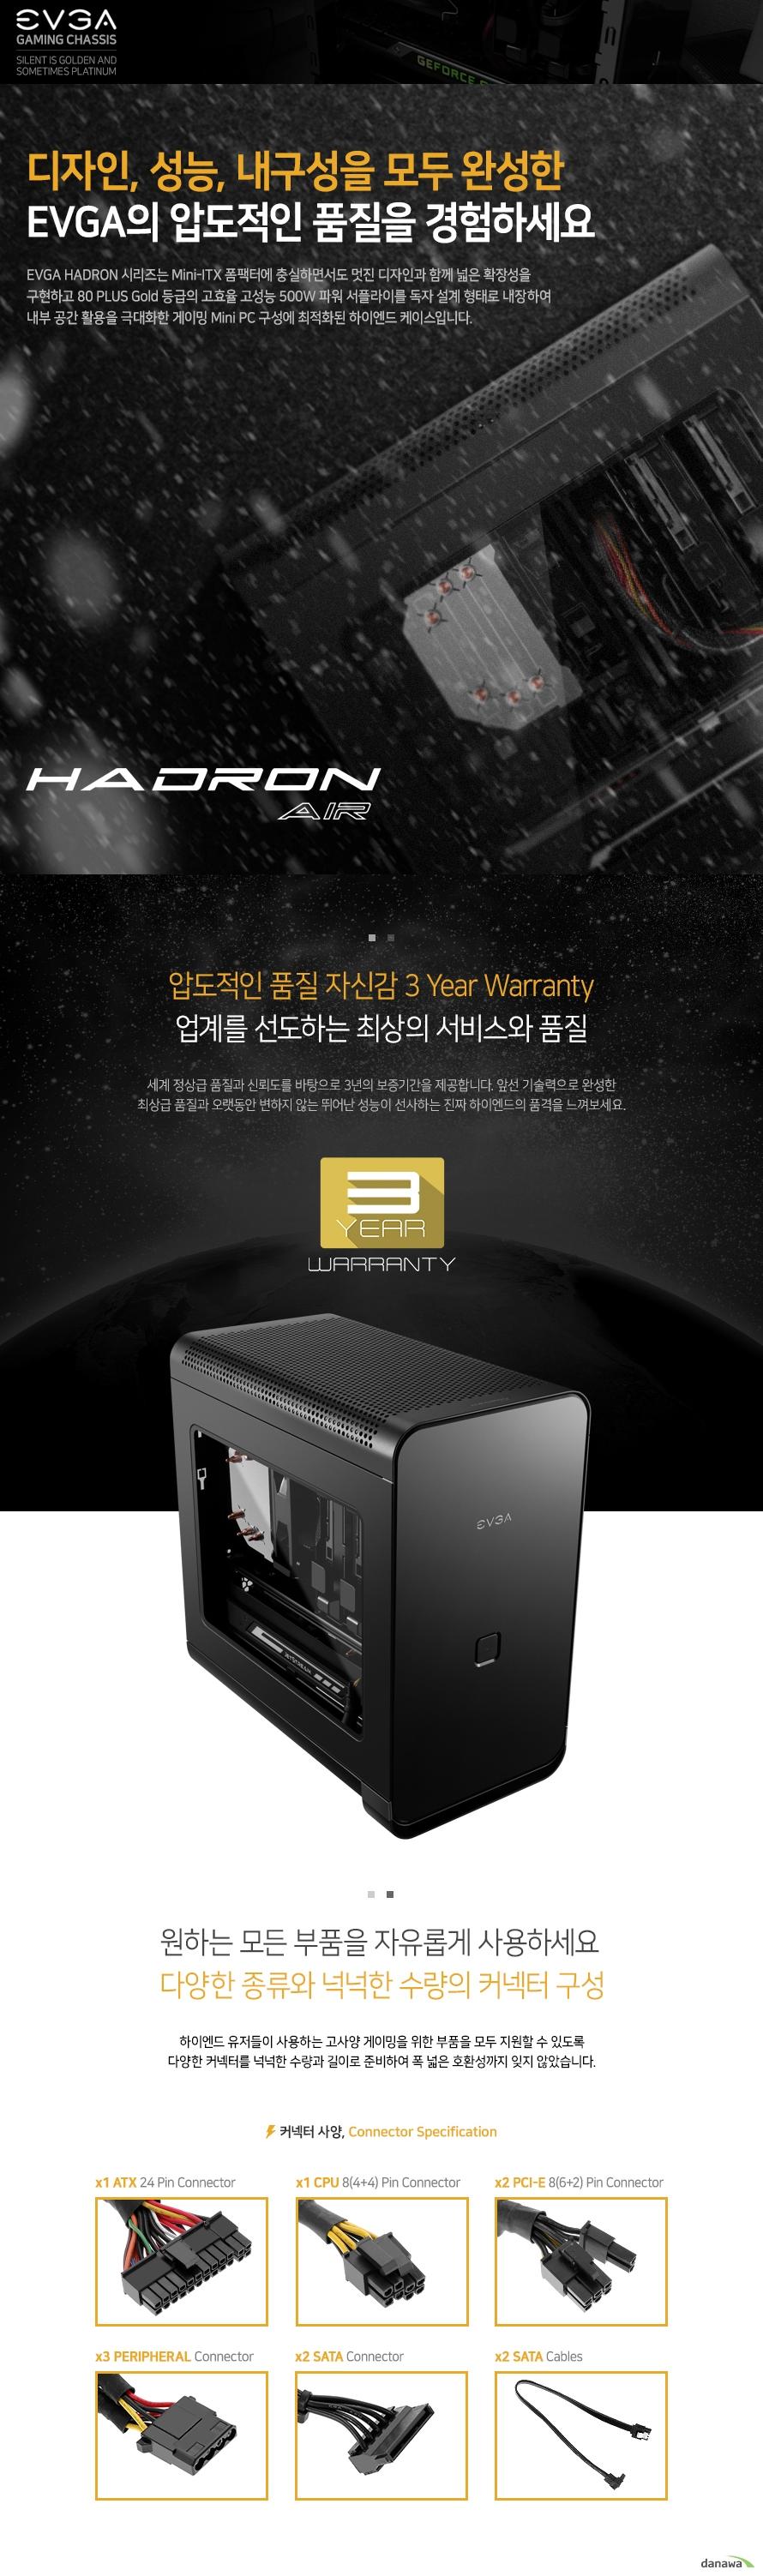 EVGA HADRON 시리즈는 Mini-ITX 폼팩터에 충실하면서도 멋진 디자인과 함께 넓은 확장성을 구현하고 80 PLUS Gold 등급의 고효율 고성능 500W 파워 서플라이를 독자 설계 형태로 내장하여 내부 공간 활용을 극대화한 게이밍 Mini PC 구성에 최적화된 하이엔드 케이스입니다. 세계 정상급 품질과 신뢰도를 바탕으로 3년의 보증기간을 제공합니다. 앞선 기술력으로 완성한 최상급 품질과 오랫동안 변하지 않는 뛰어난 성능이 선사하는 진짜 하이엔드의 품격을 느껴보세요. 하이엔드 유저들이 사용하는 고사양 게이밍을 위한 부품을 모두 지원할 수 있도록 다양한 커넥터를 넉넉한 수량과 길이로 준비하여 폭 넓은 호환성까지 잊지 않았습니다.